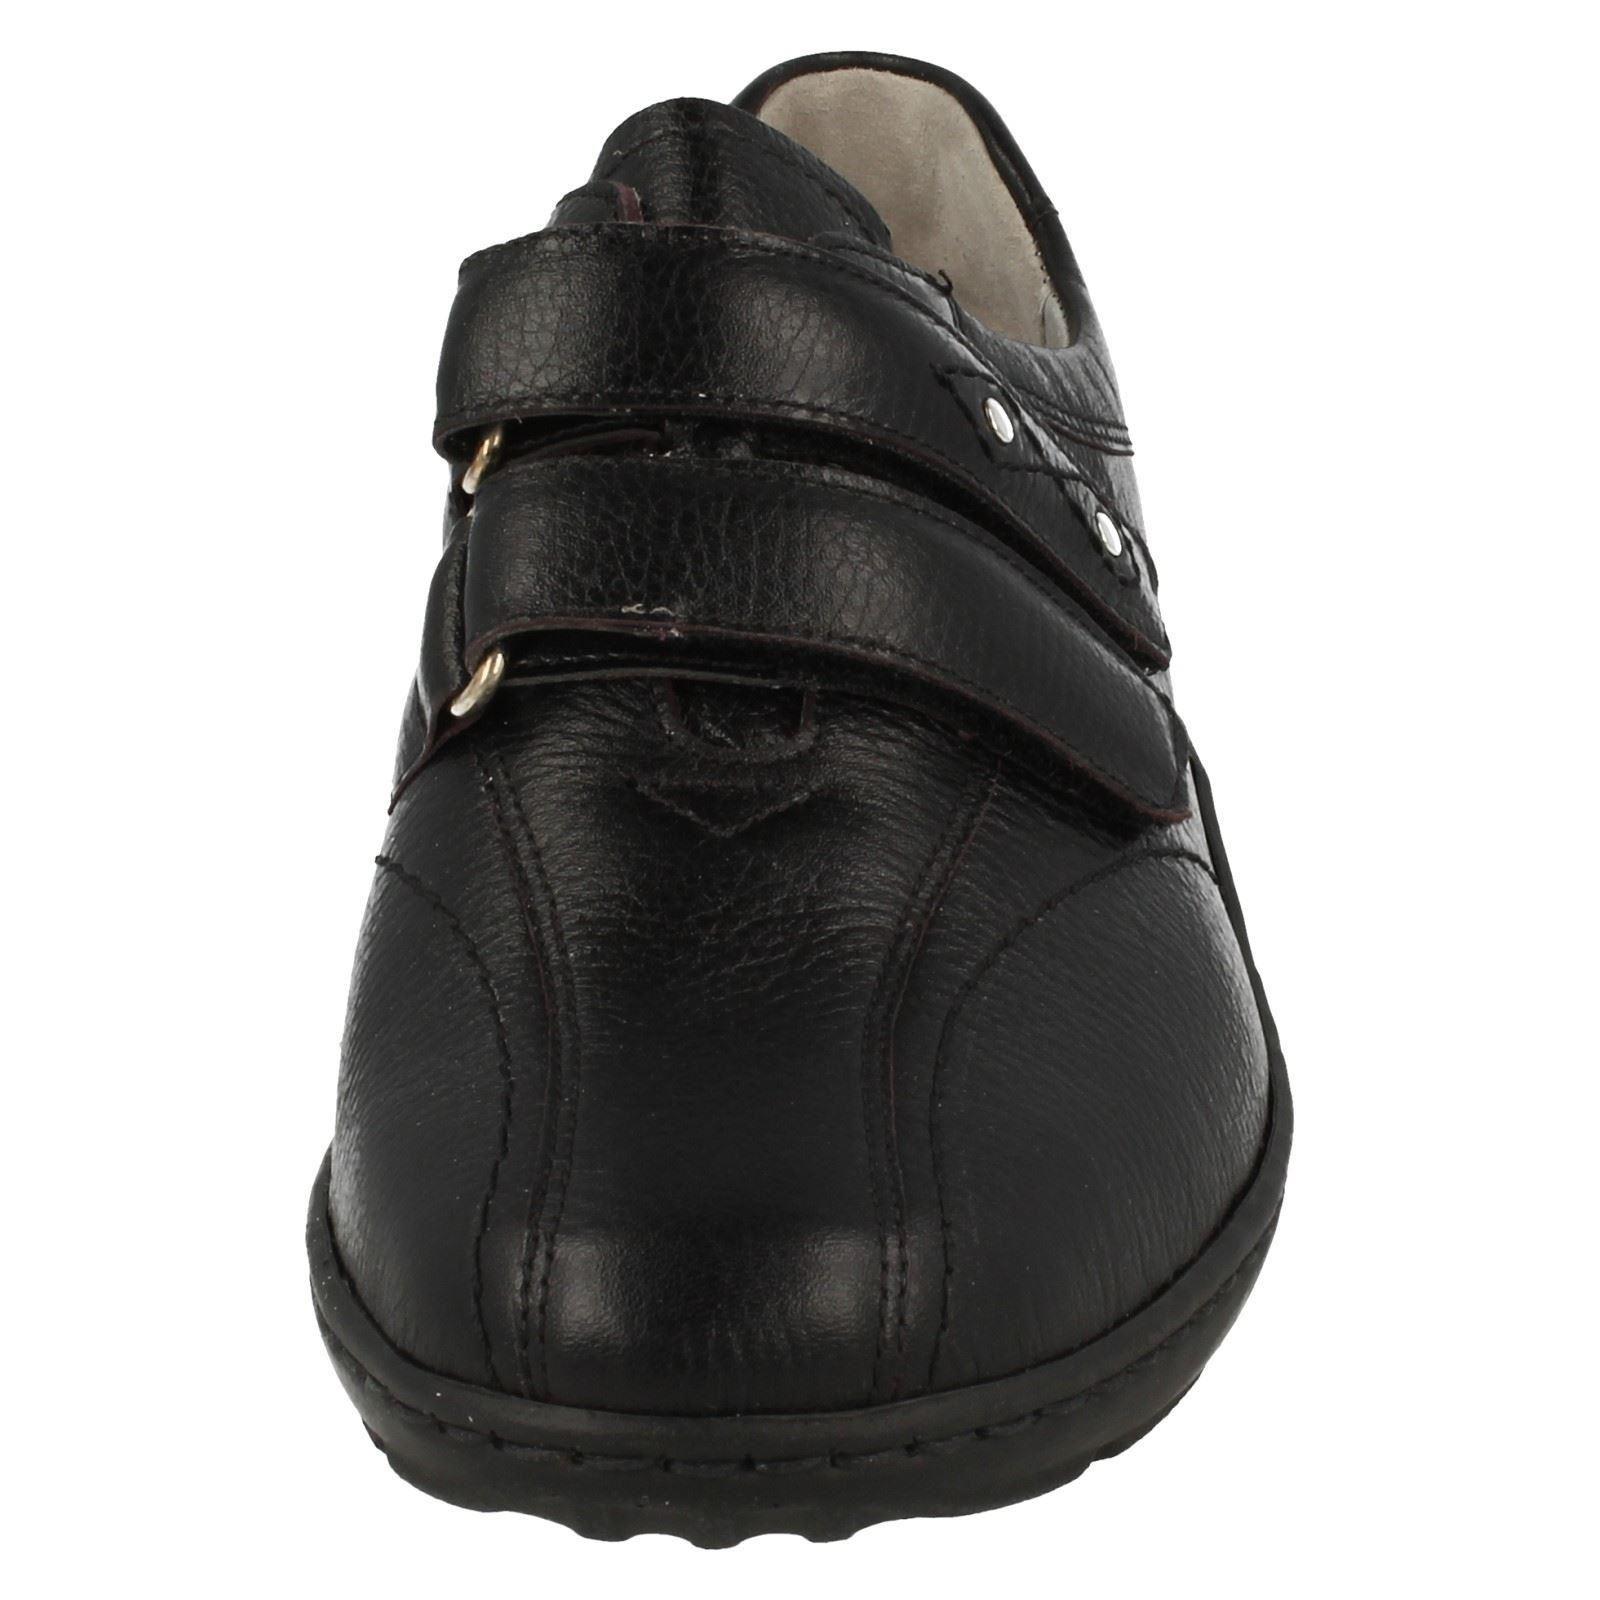 Ladies Waldlaufer Casual Everyday Shoes 496301